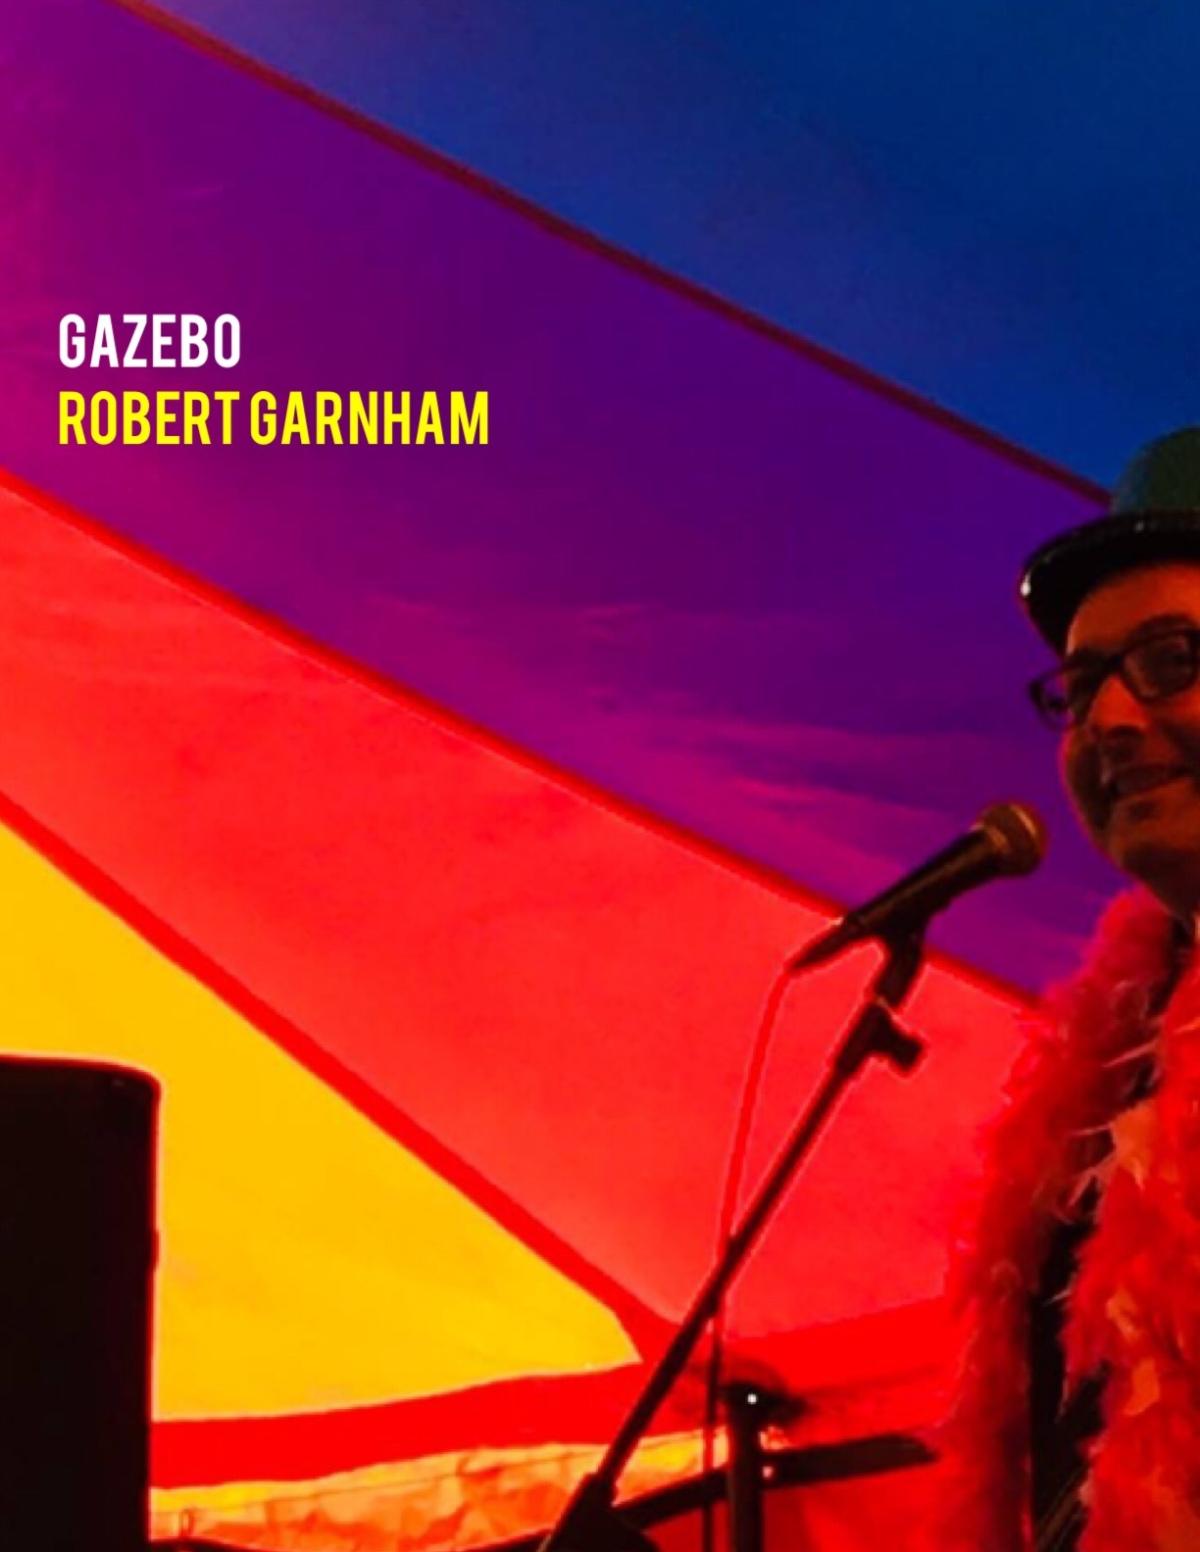 Gazebo : A new collection from RobertGarnham